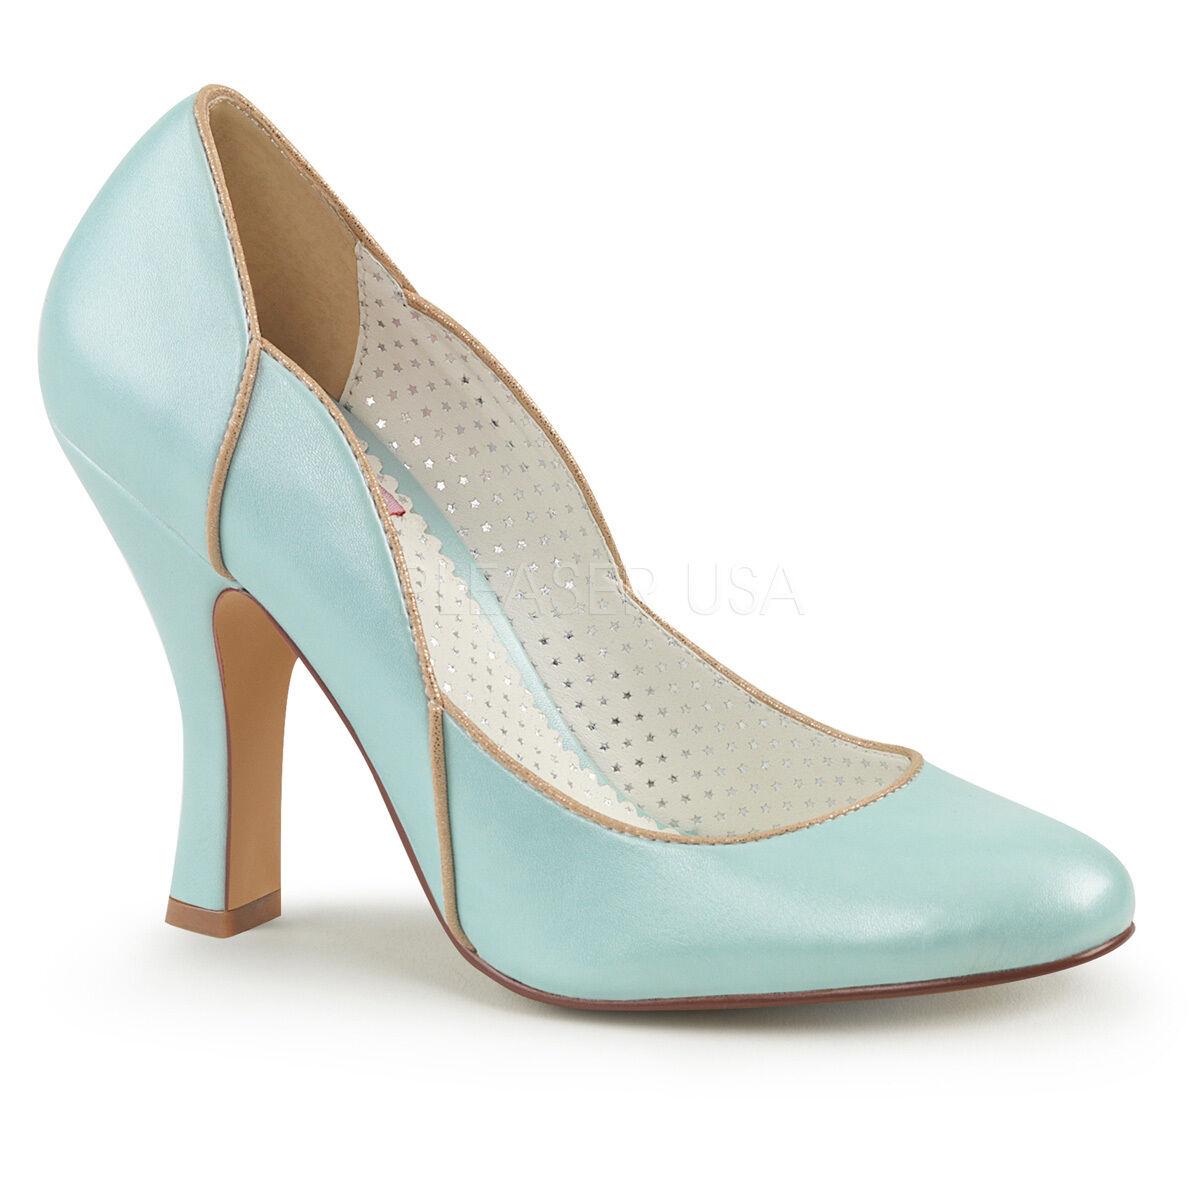 Sexy 4  High Heel Baby bluee Pumps shoes w  Wavy gold Trim Topline SMITT04 BBPU